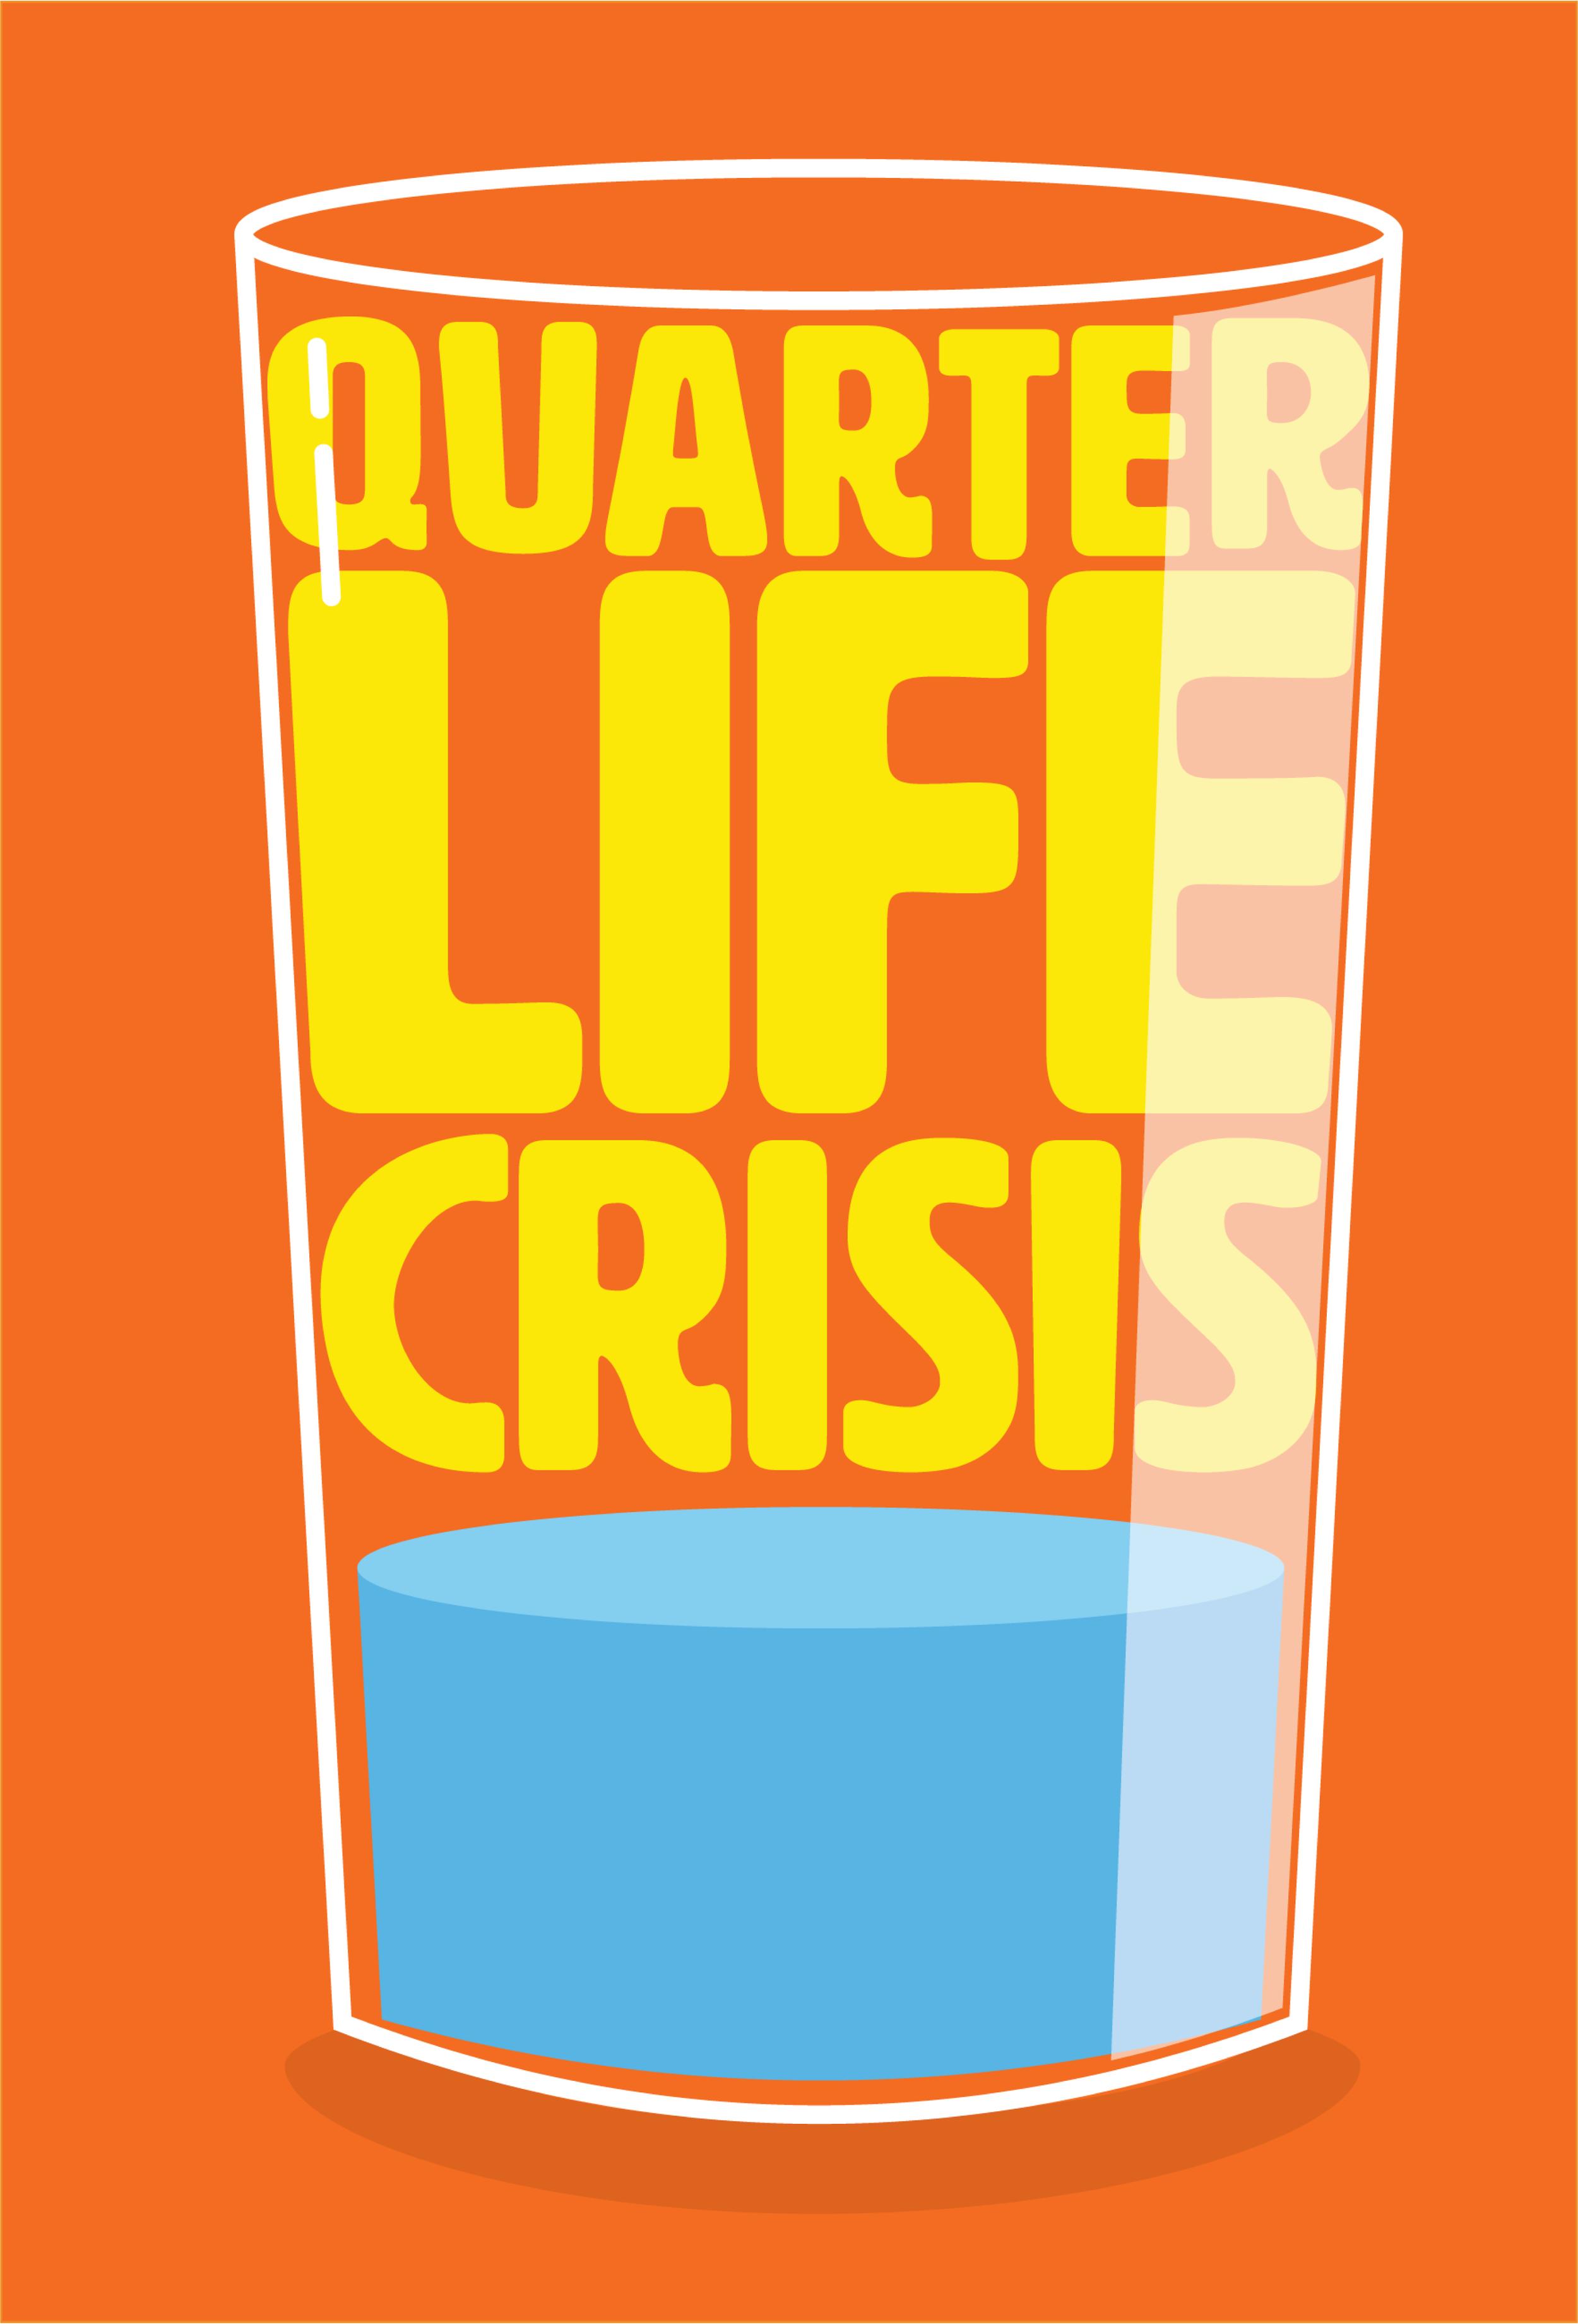 quarterlifecrisis-01.png